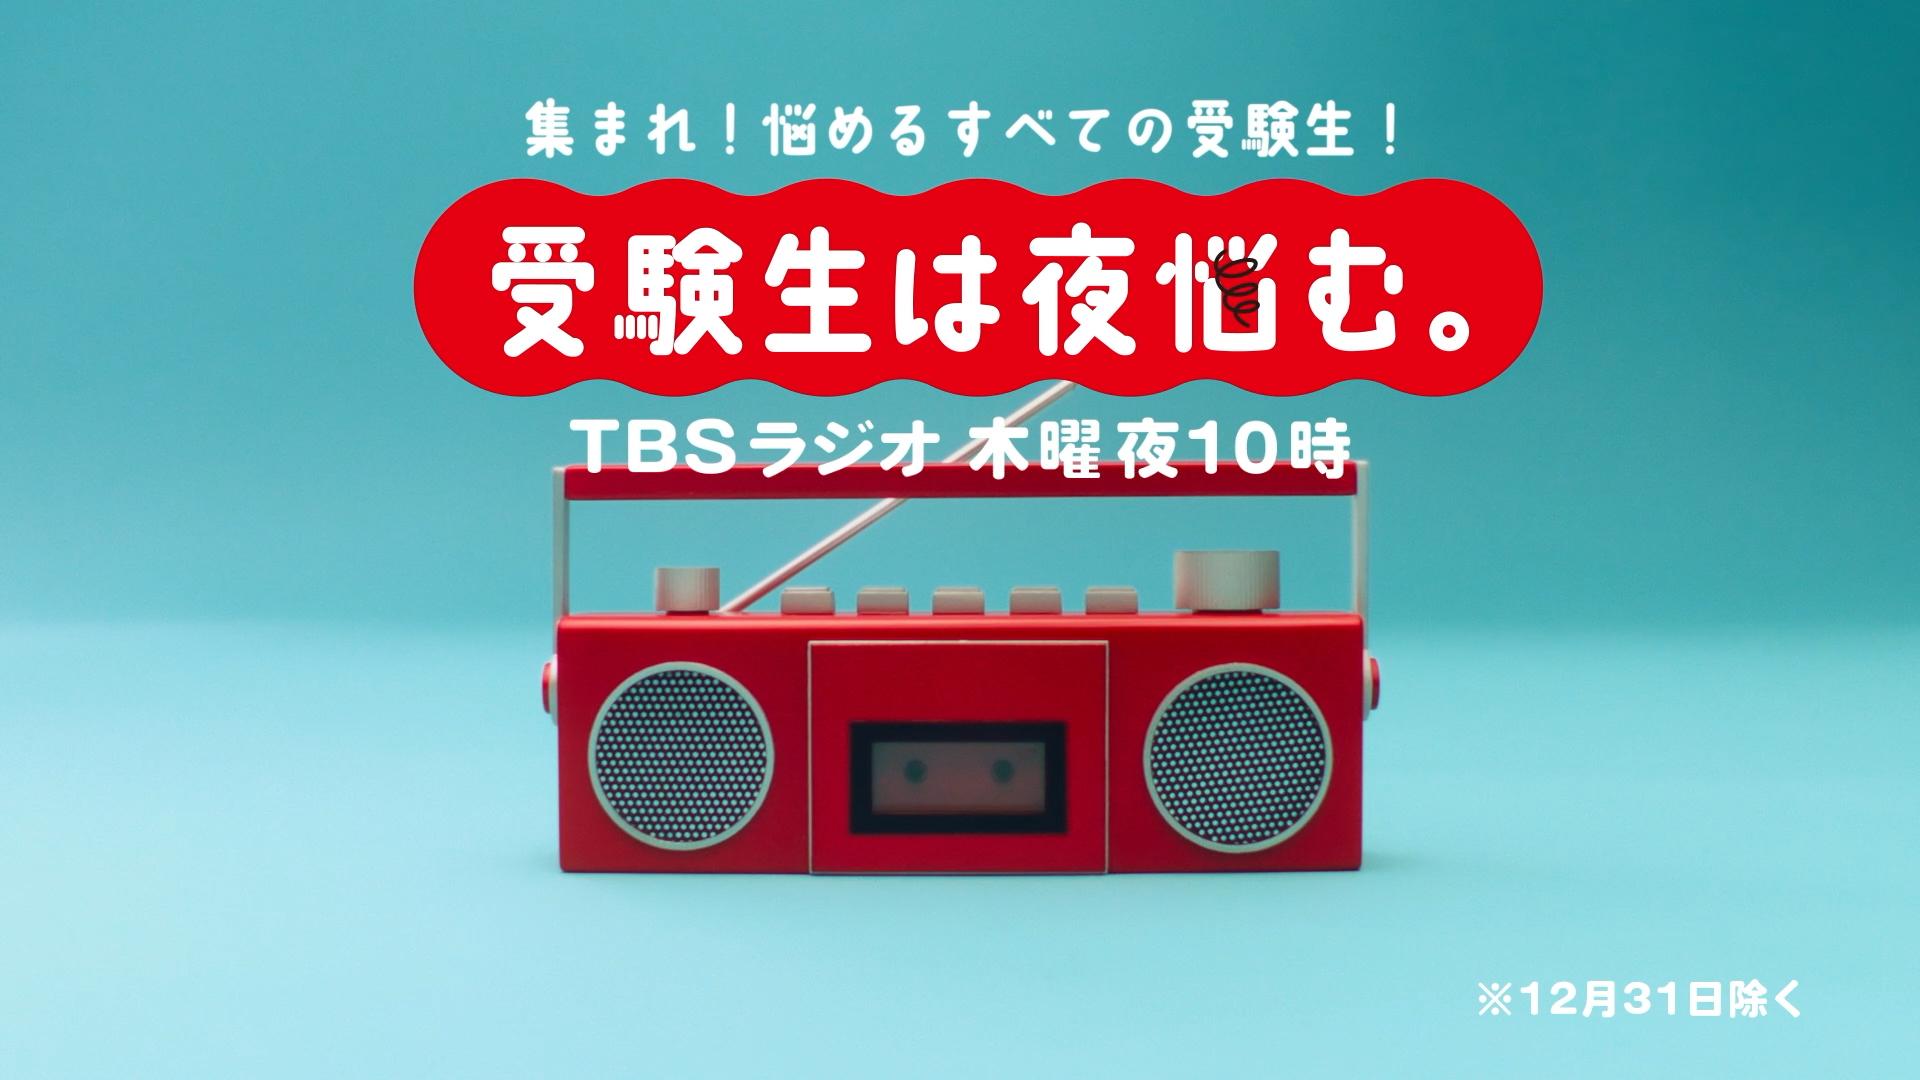 TBSラジオ『受験生は夜悩む Presented by 明治R-1』